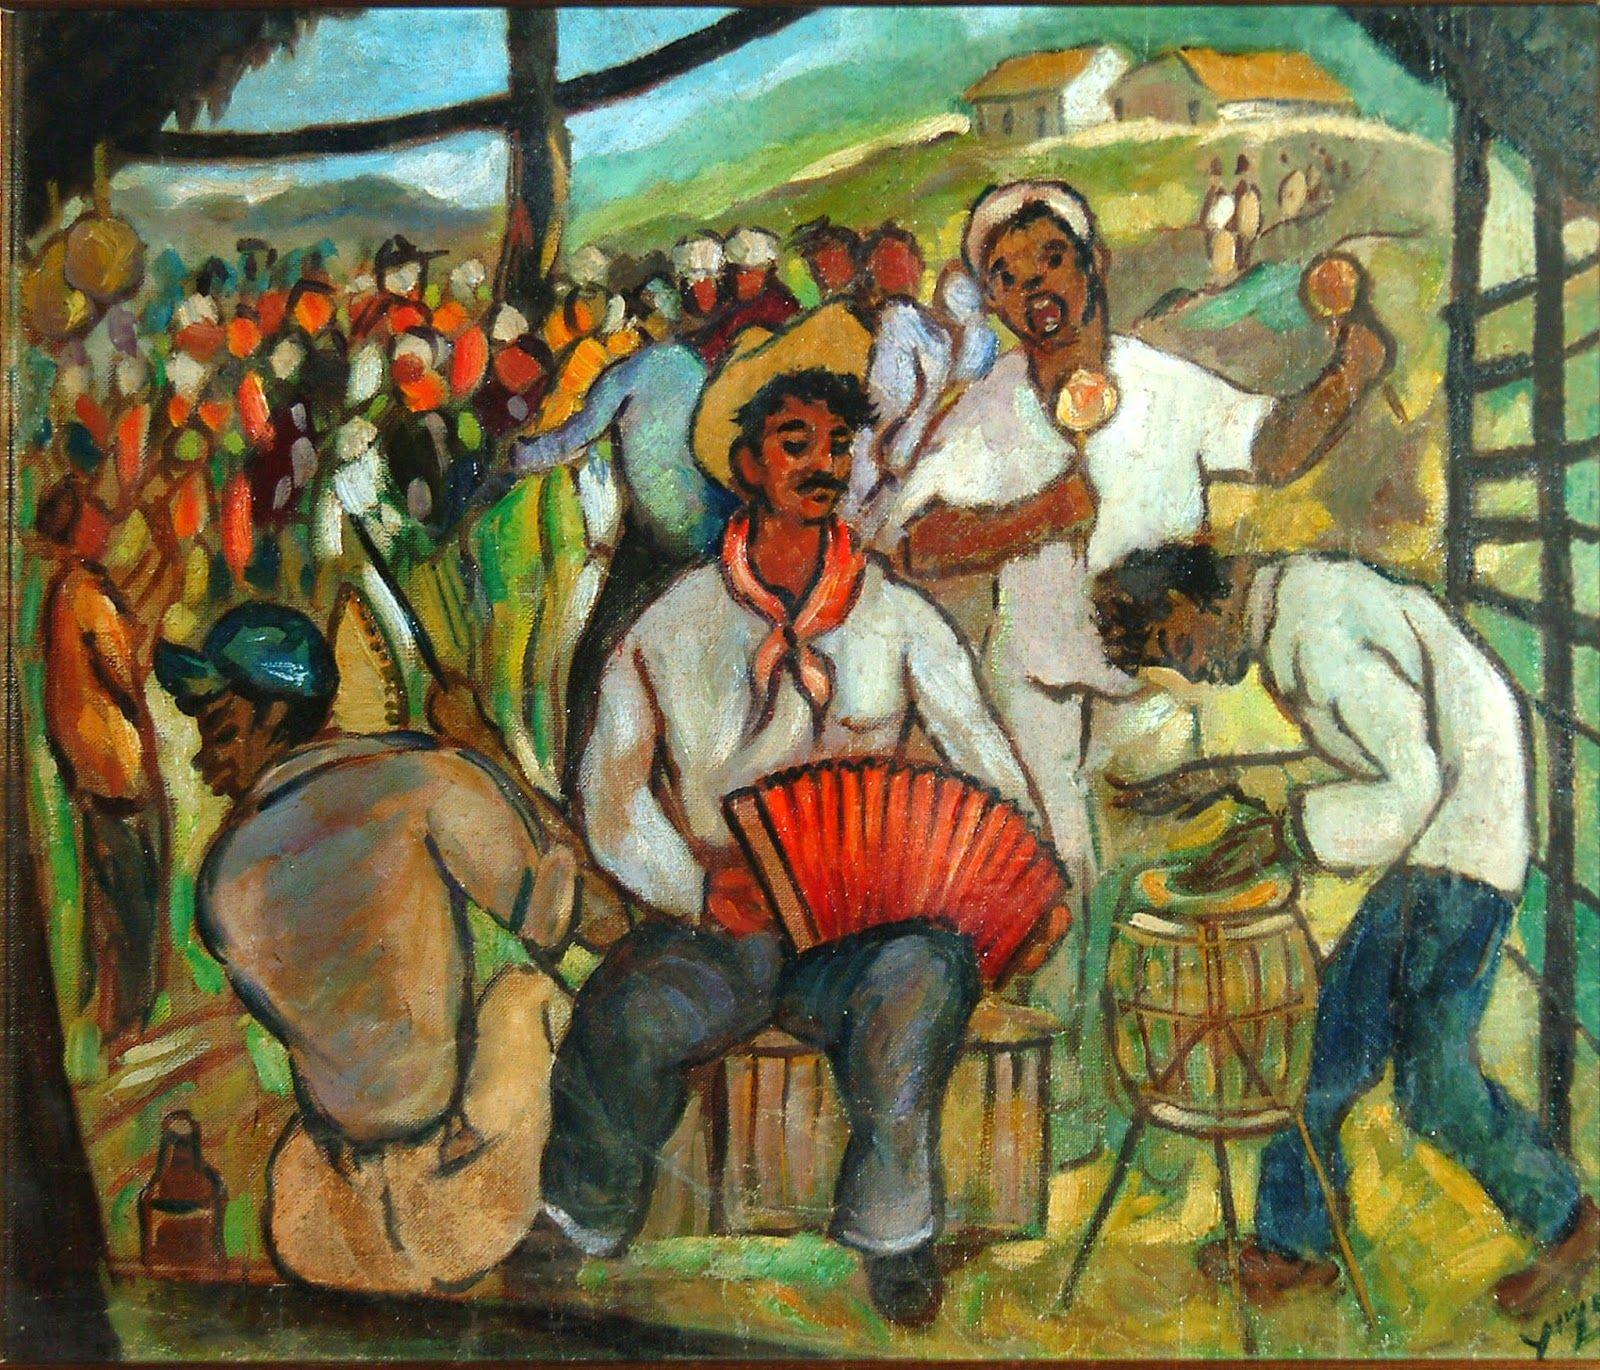 Yoryi Morel - Google Dominican Painters Caribbean Art Artist